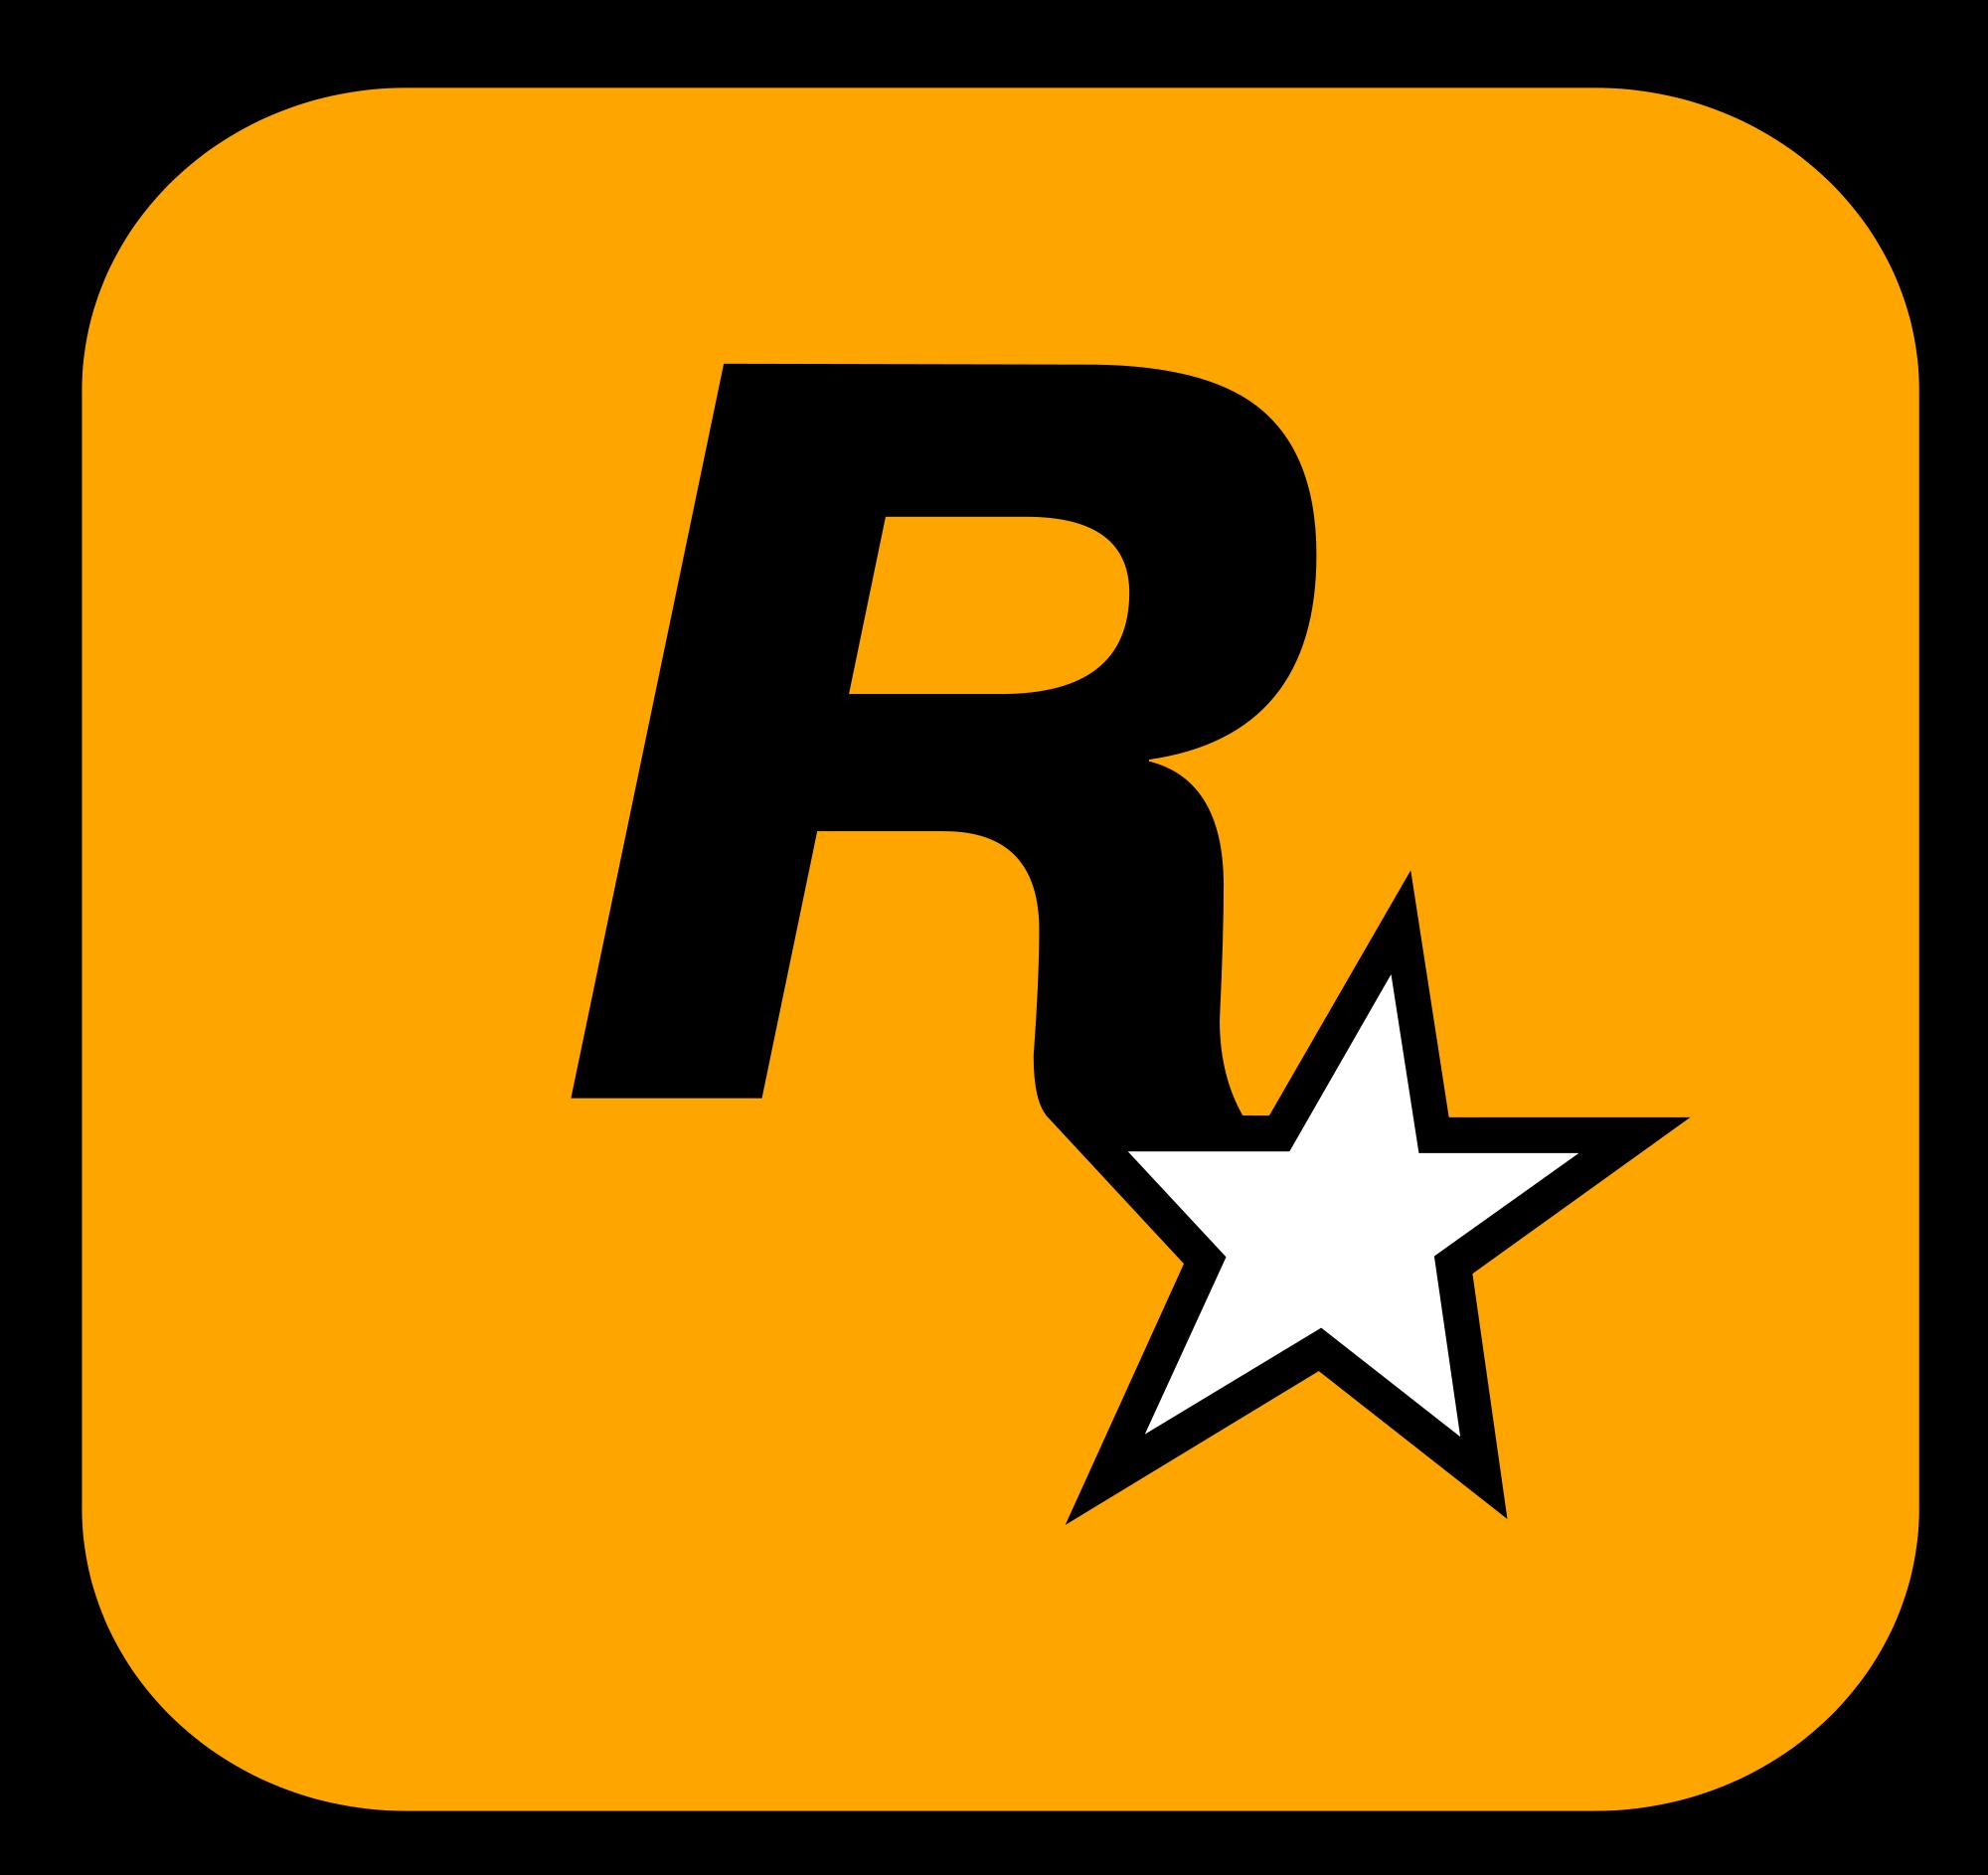 Rockstar PNG